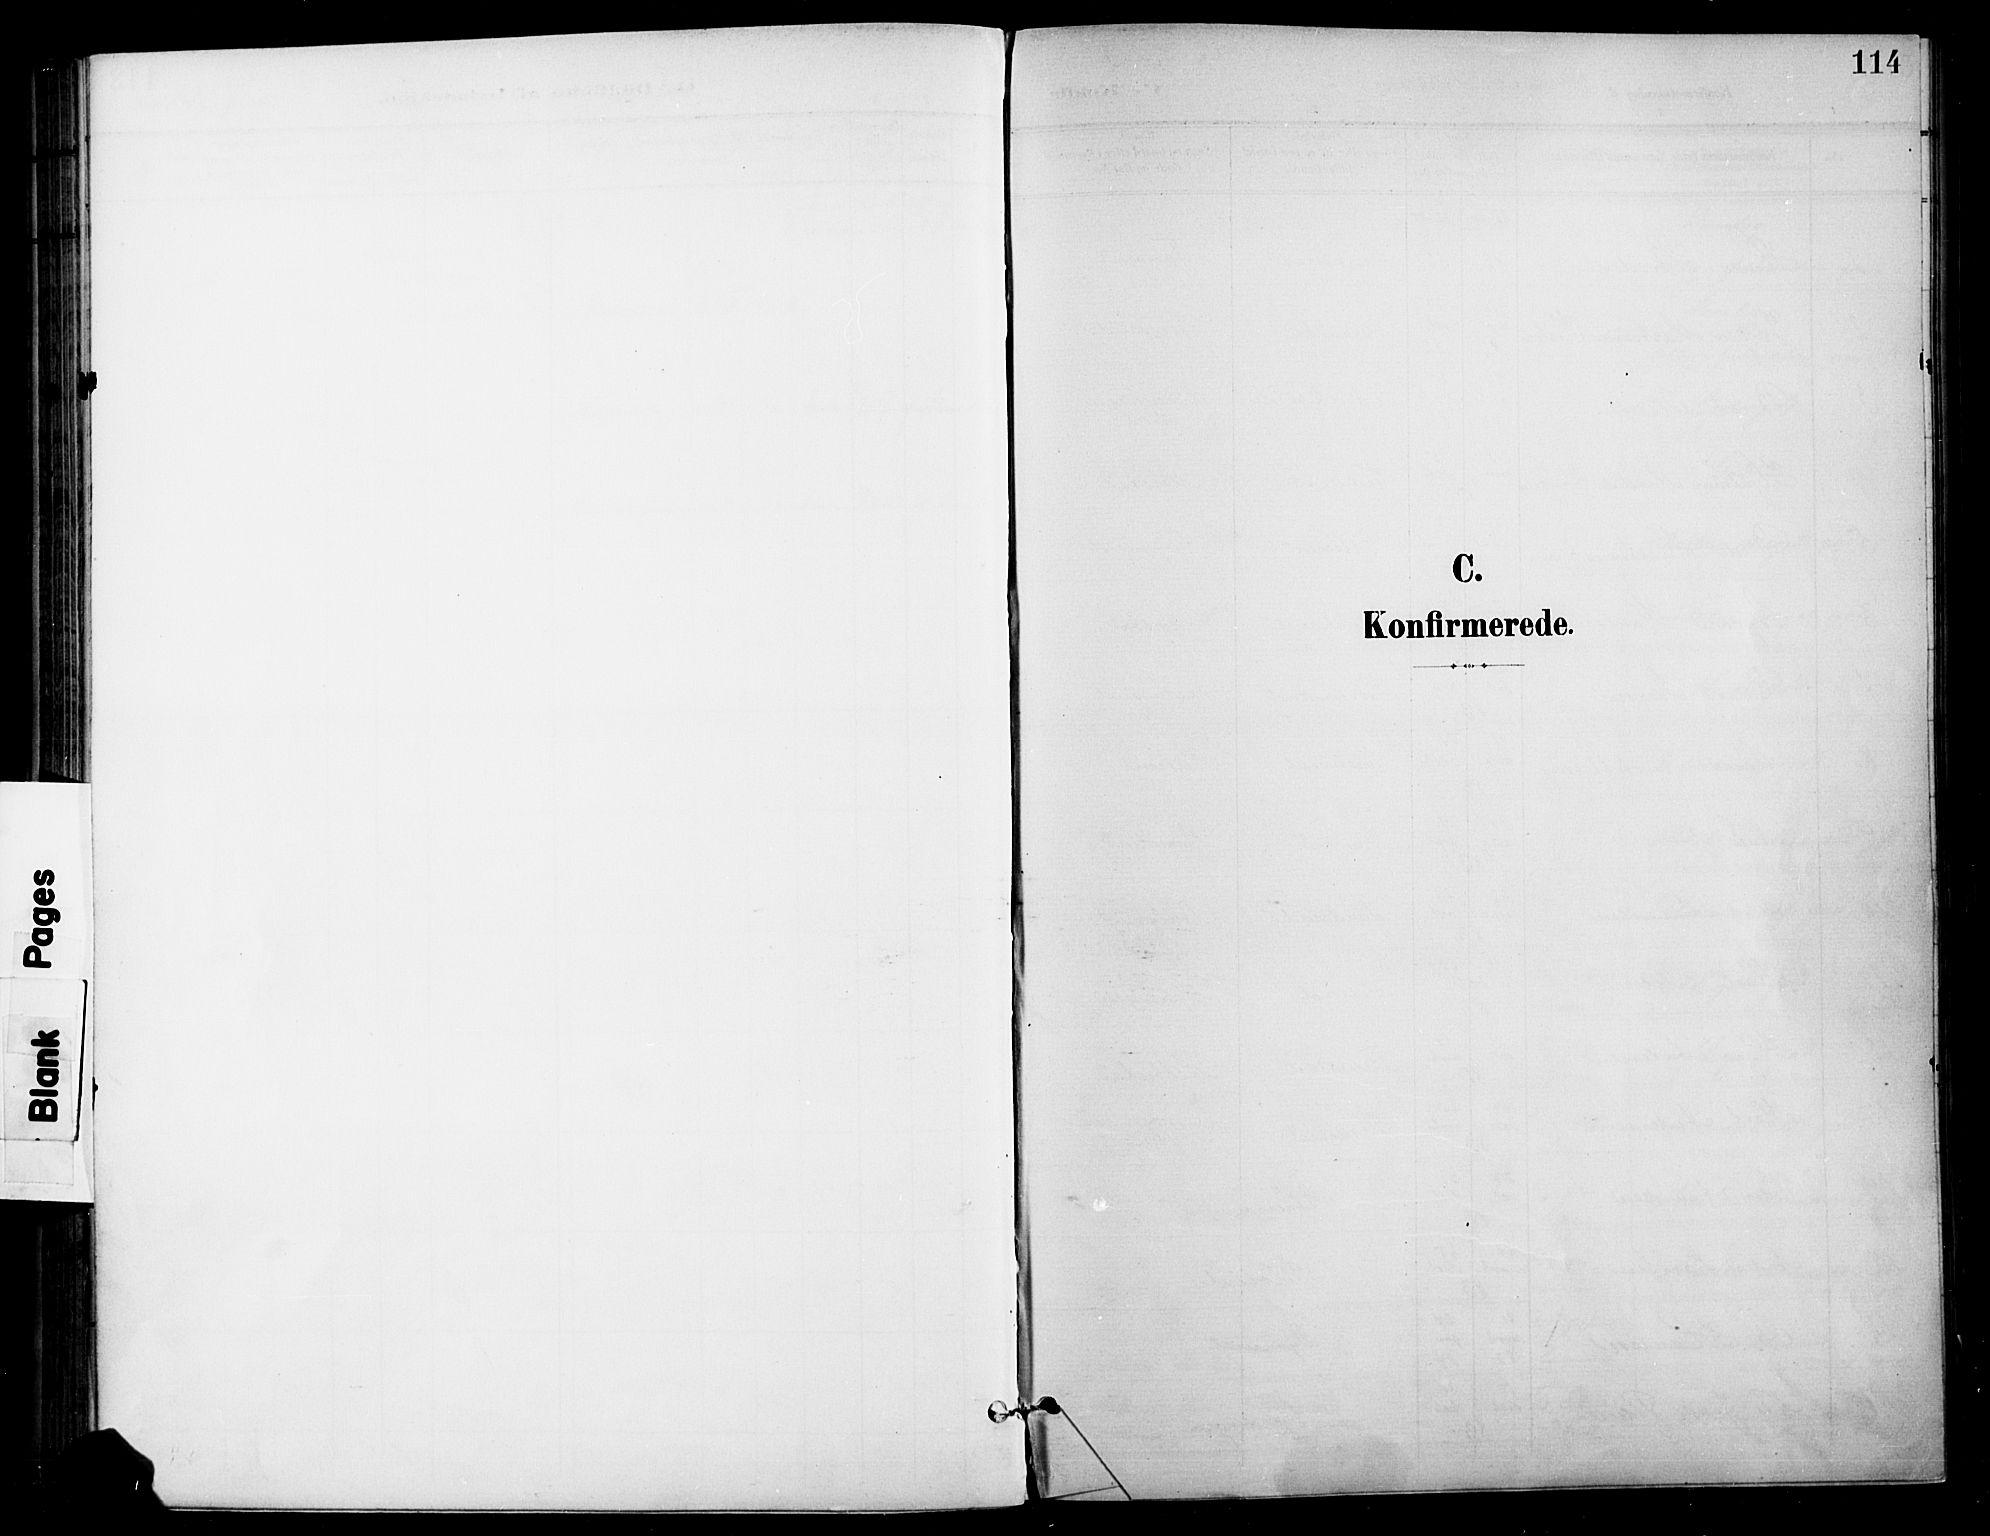 SAH, Gran prestekontor, Ministerialbok nr. 19, 1898-1907, s. 114